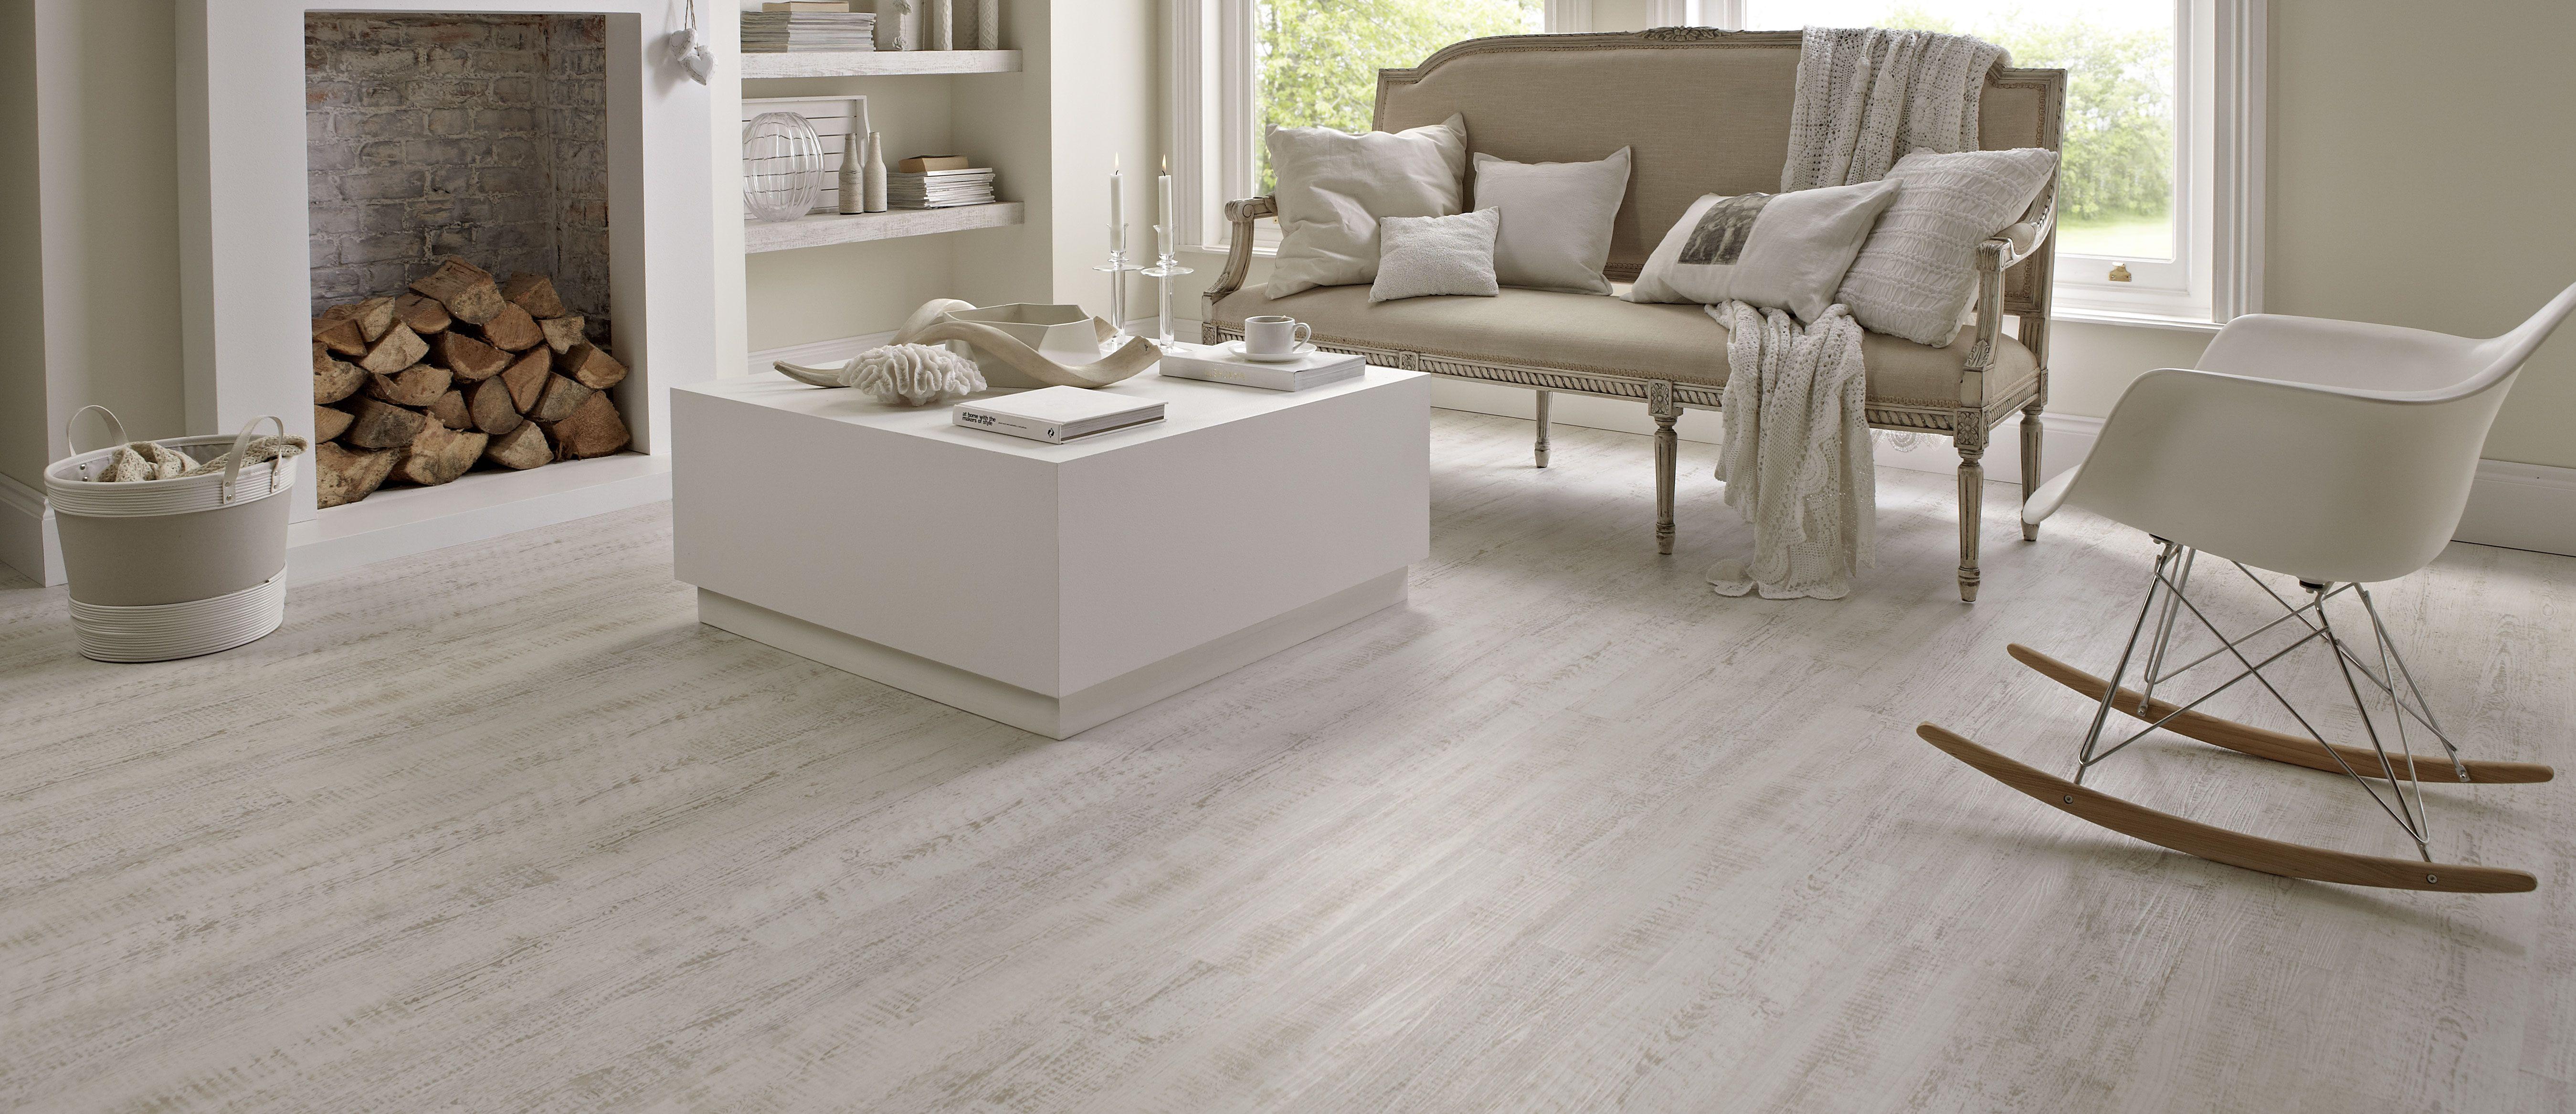 white oregon salvaged oak spaulted floor flooring